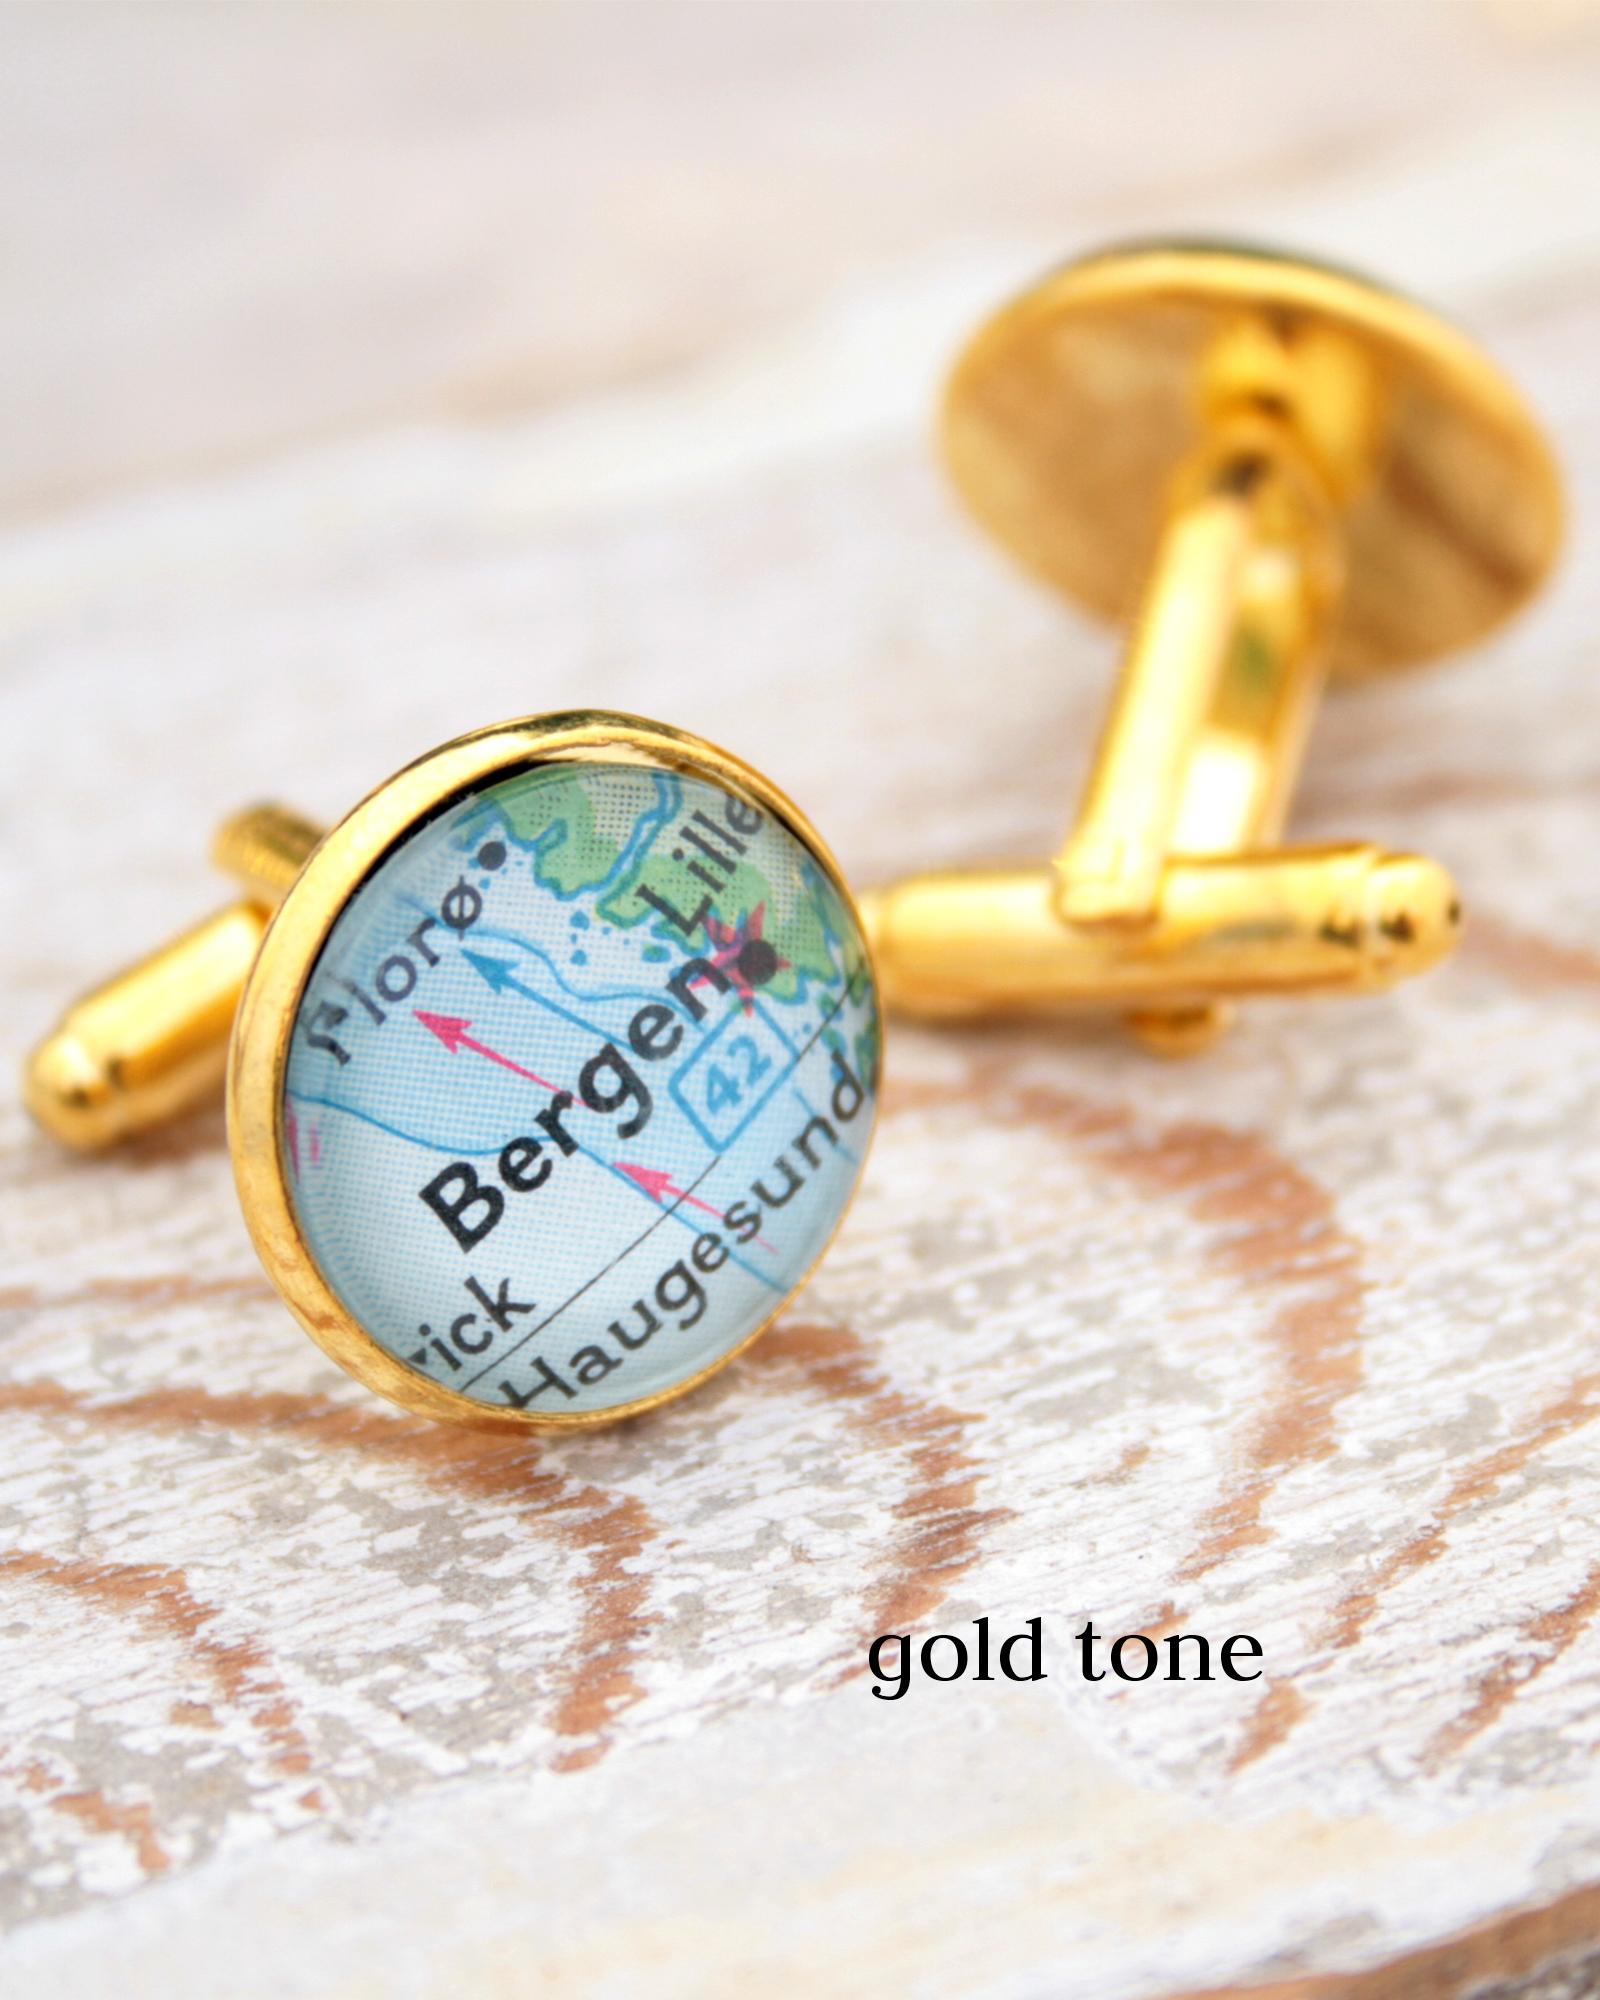 custom map cufflinks in golden colour